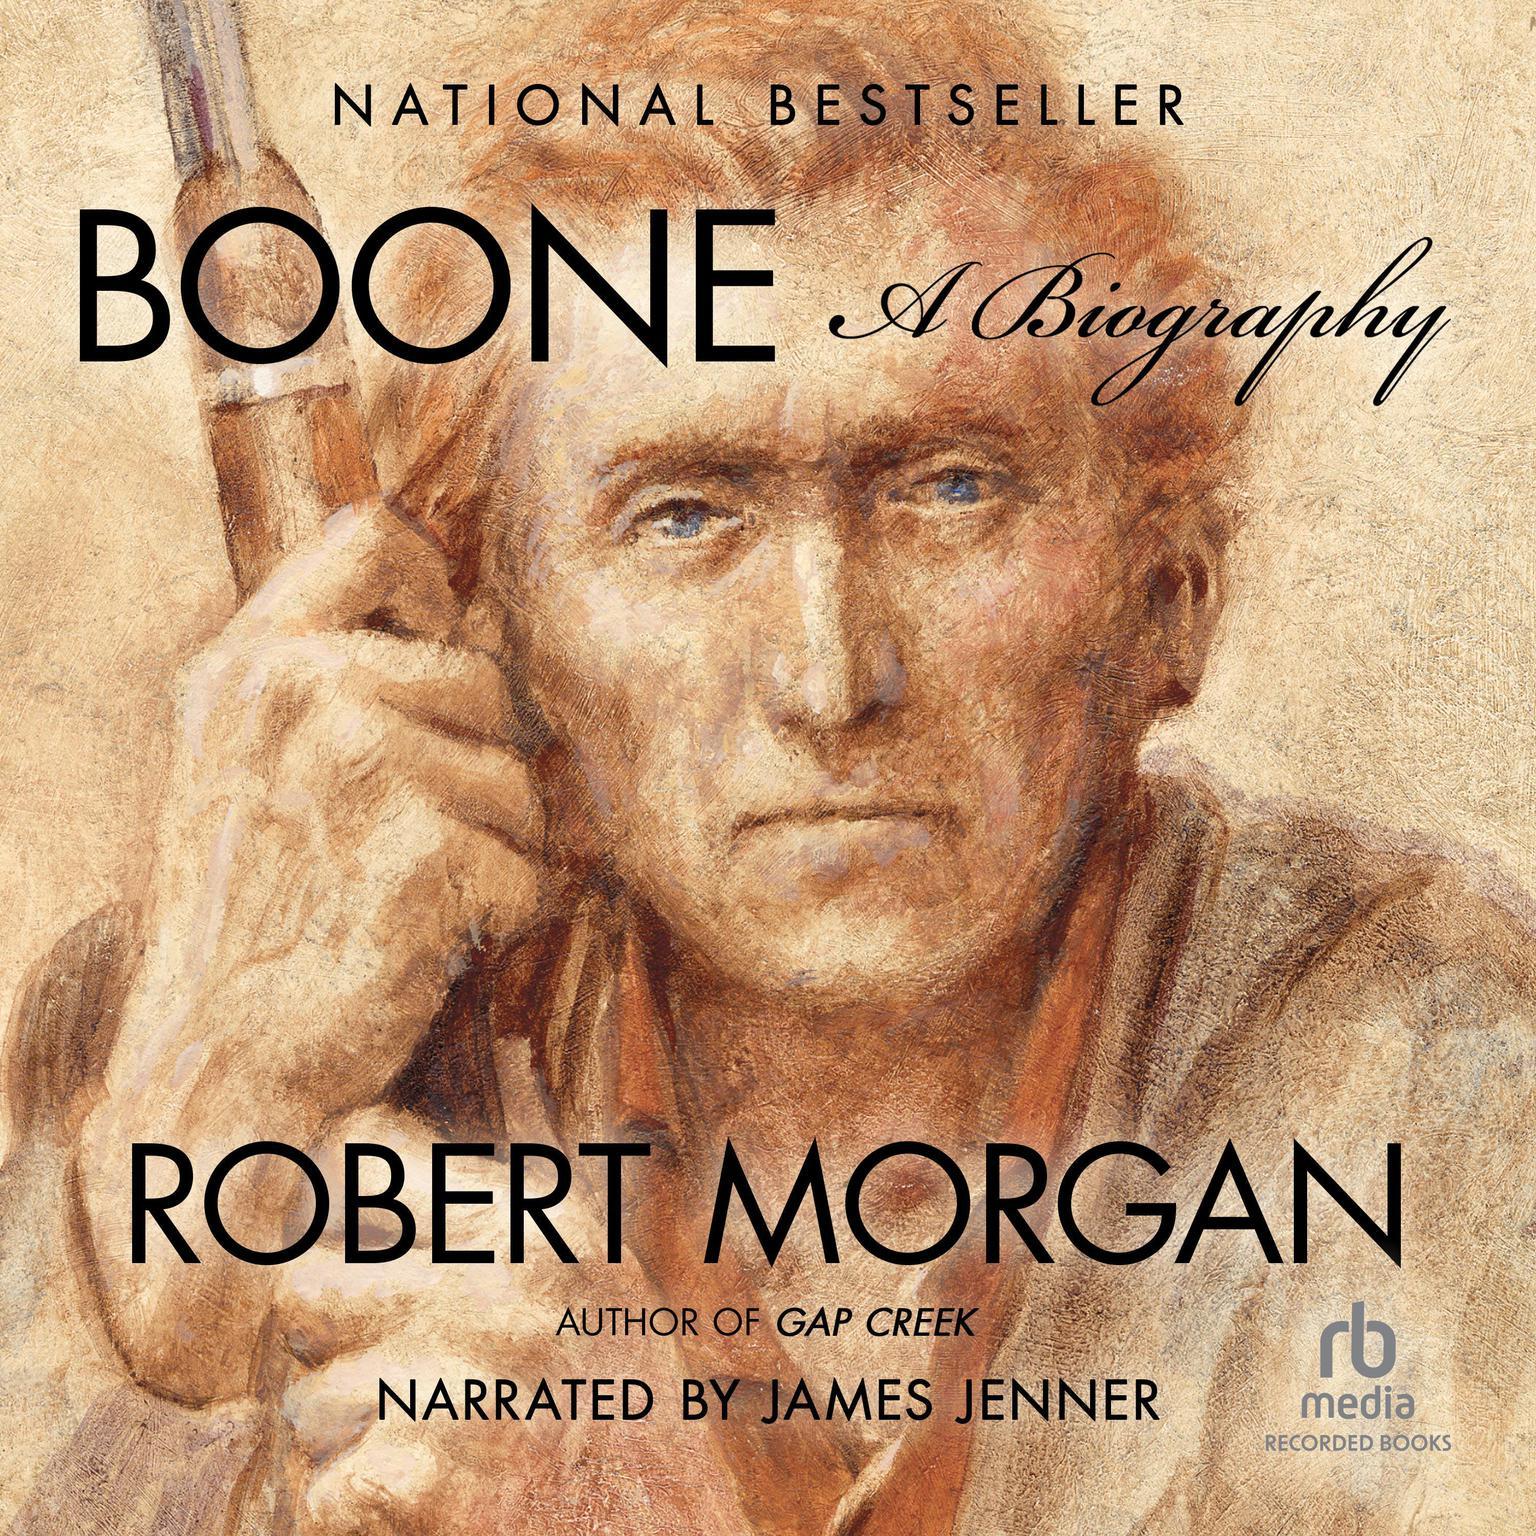 Boone: A Biography Audiobook, by Robert Morgan